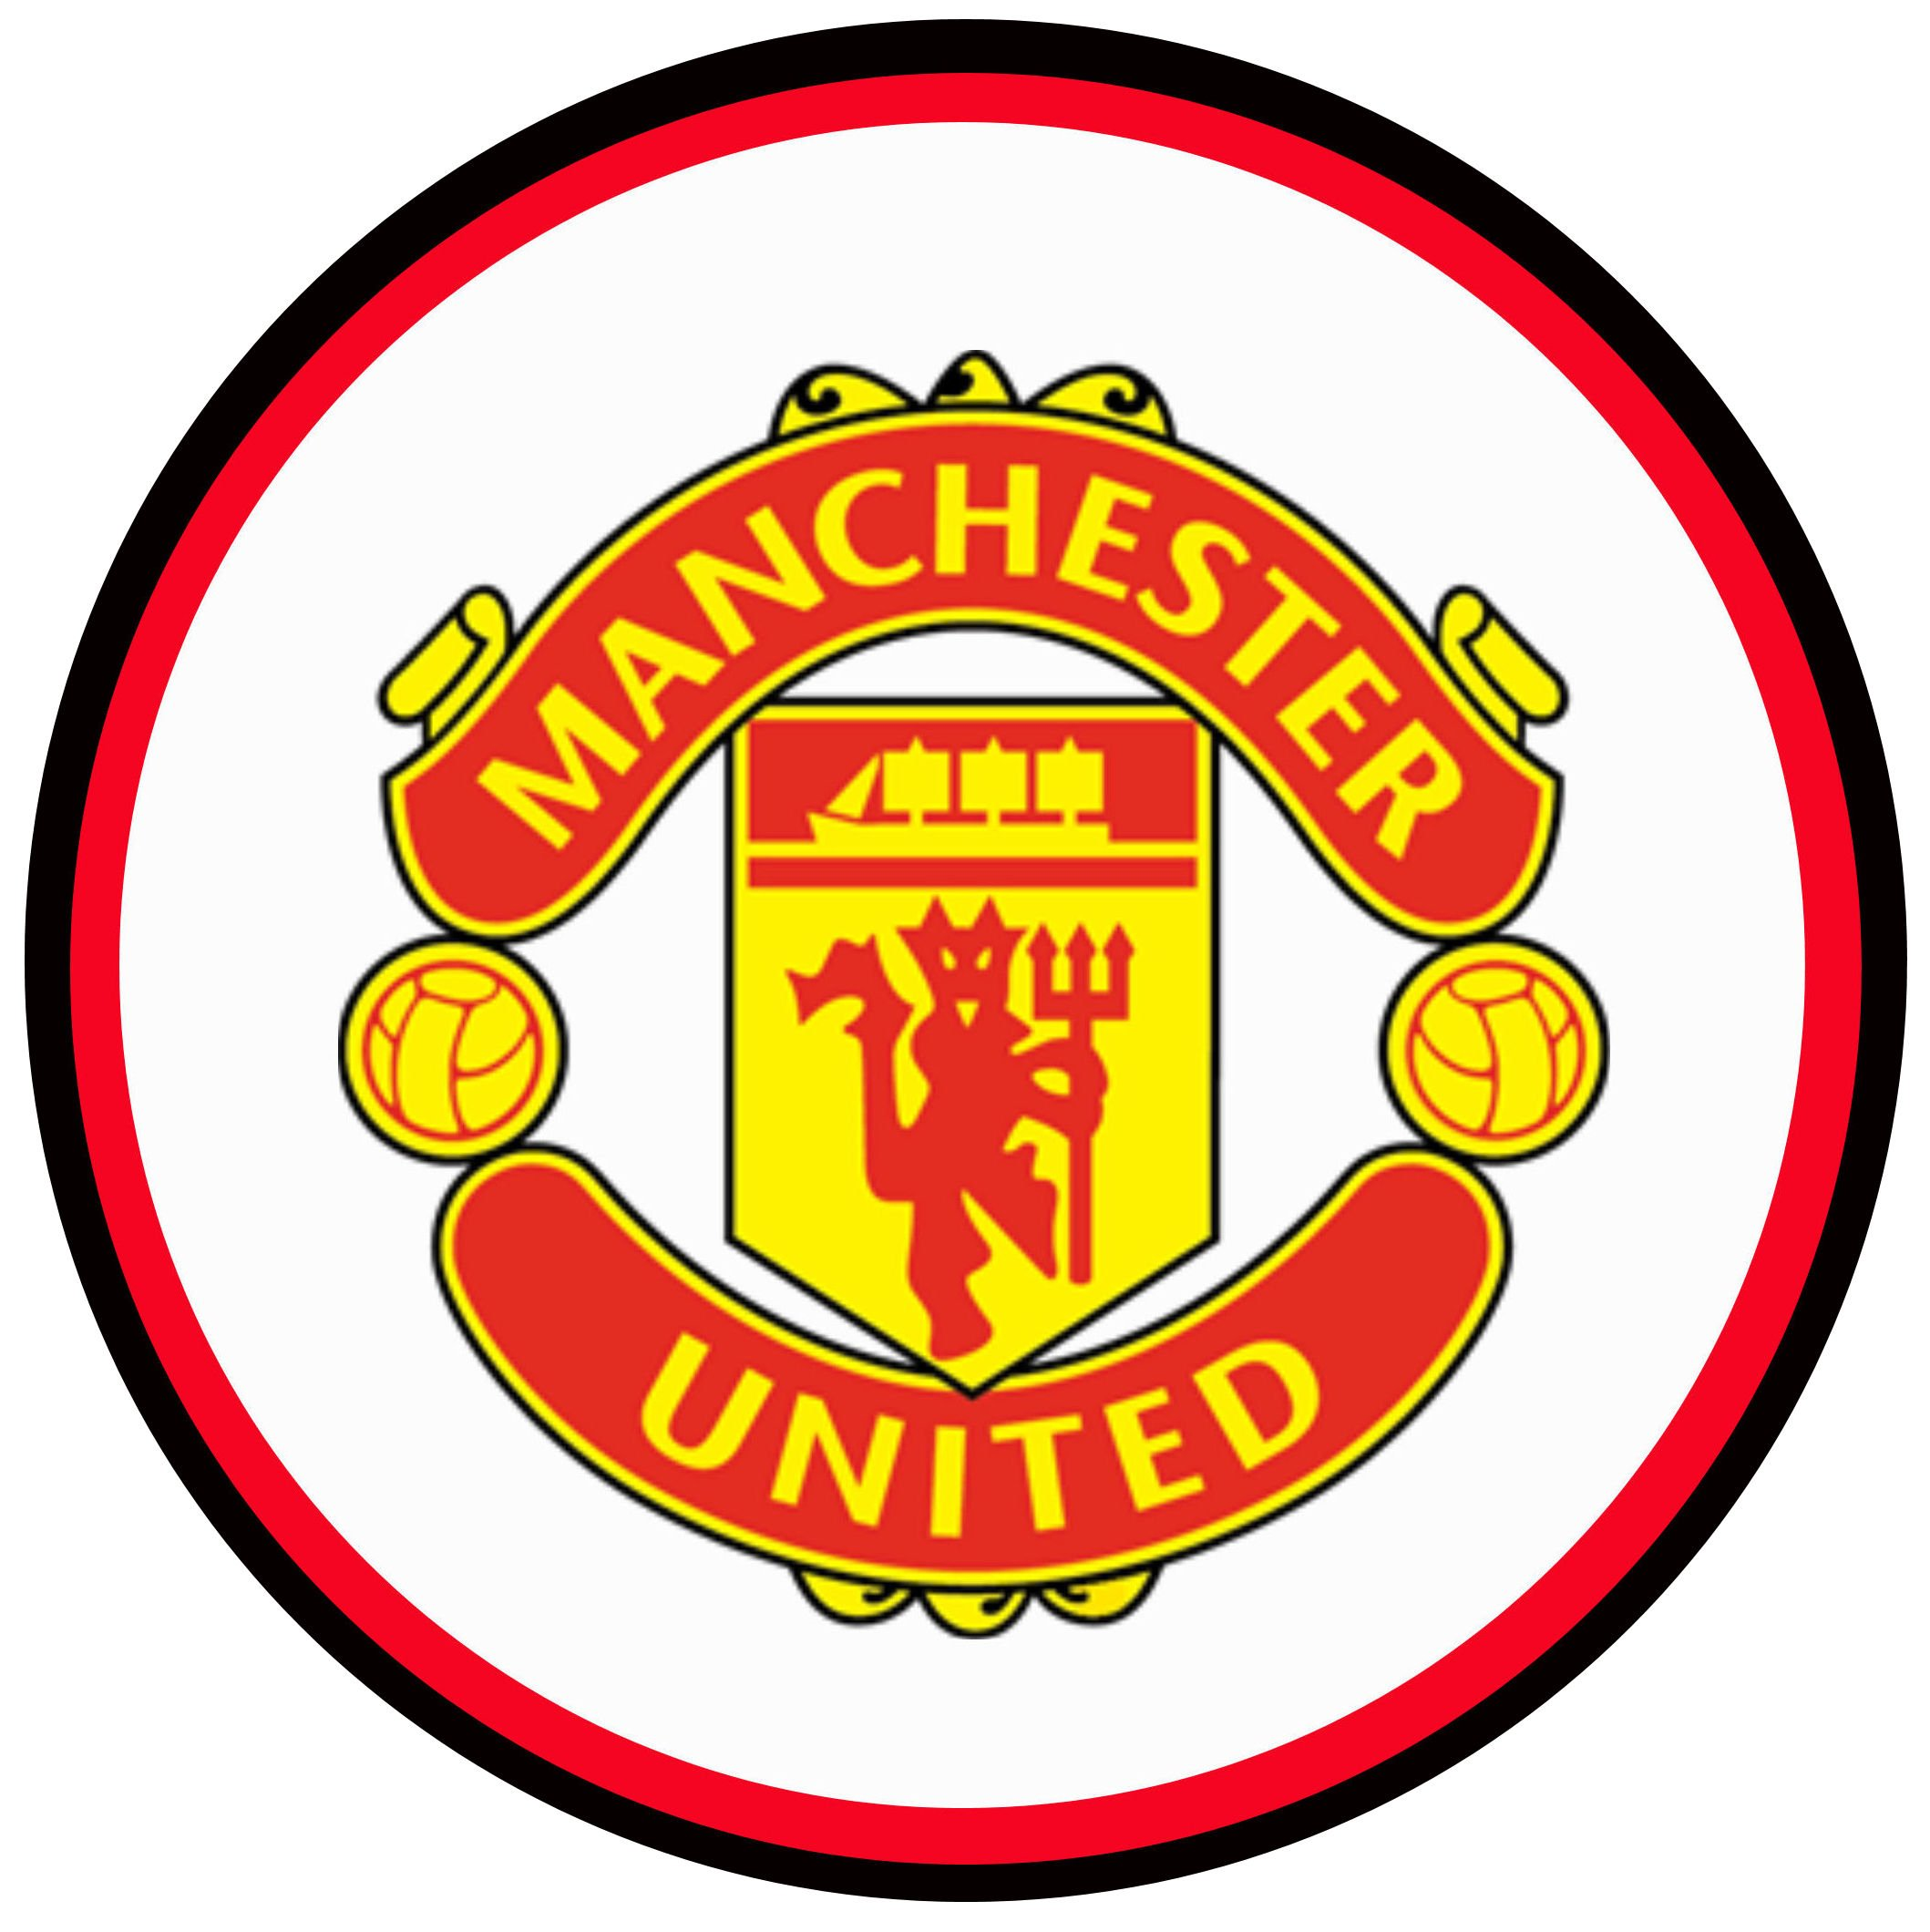 manchester united logo circle cake topper rh wagcakebits co uk man united logo wallpaper man united logo wallpaper